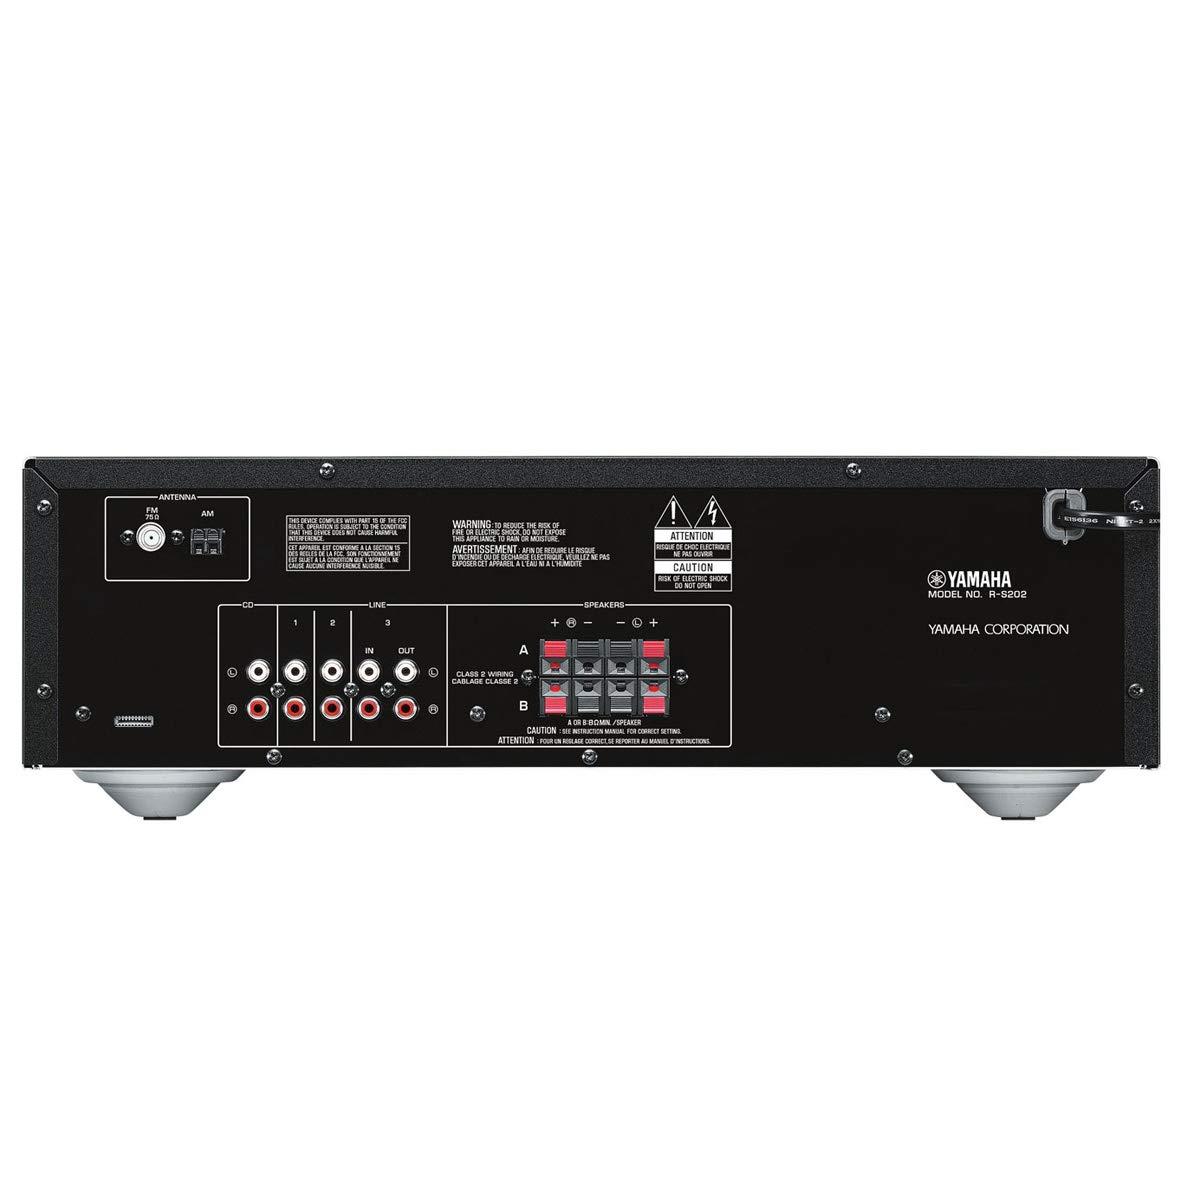 Amazon.com: Yamaha R-S202 - Receptor estéreo Bluetooth con ...